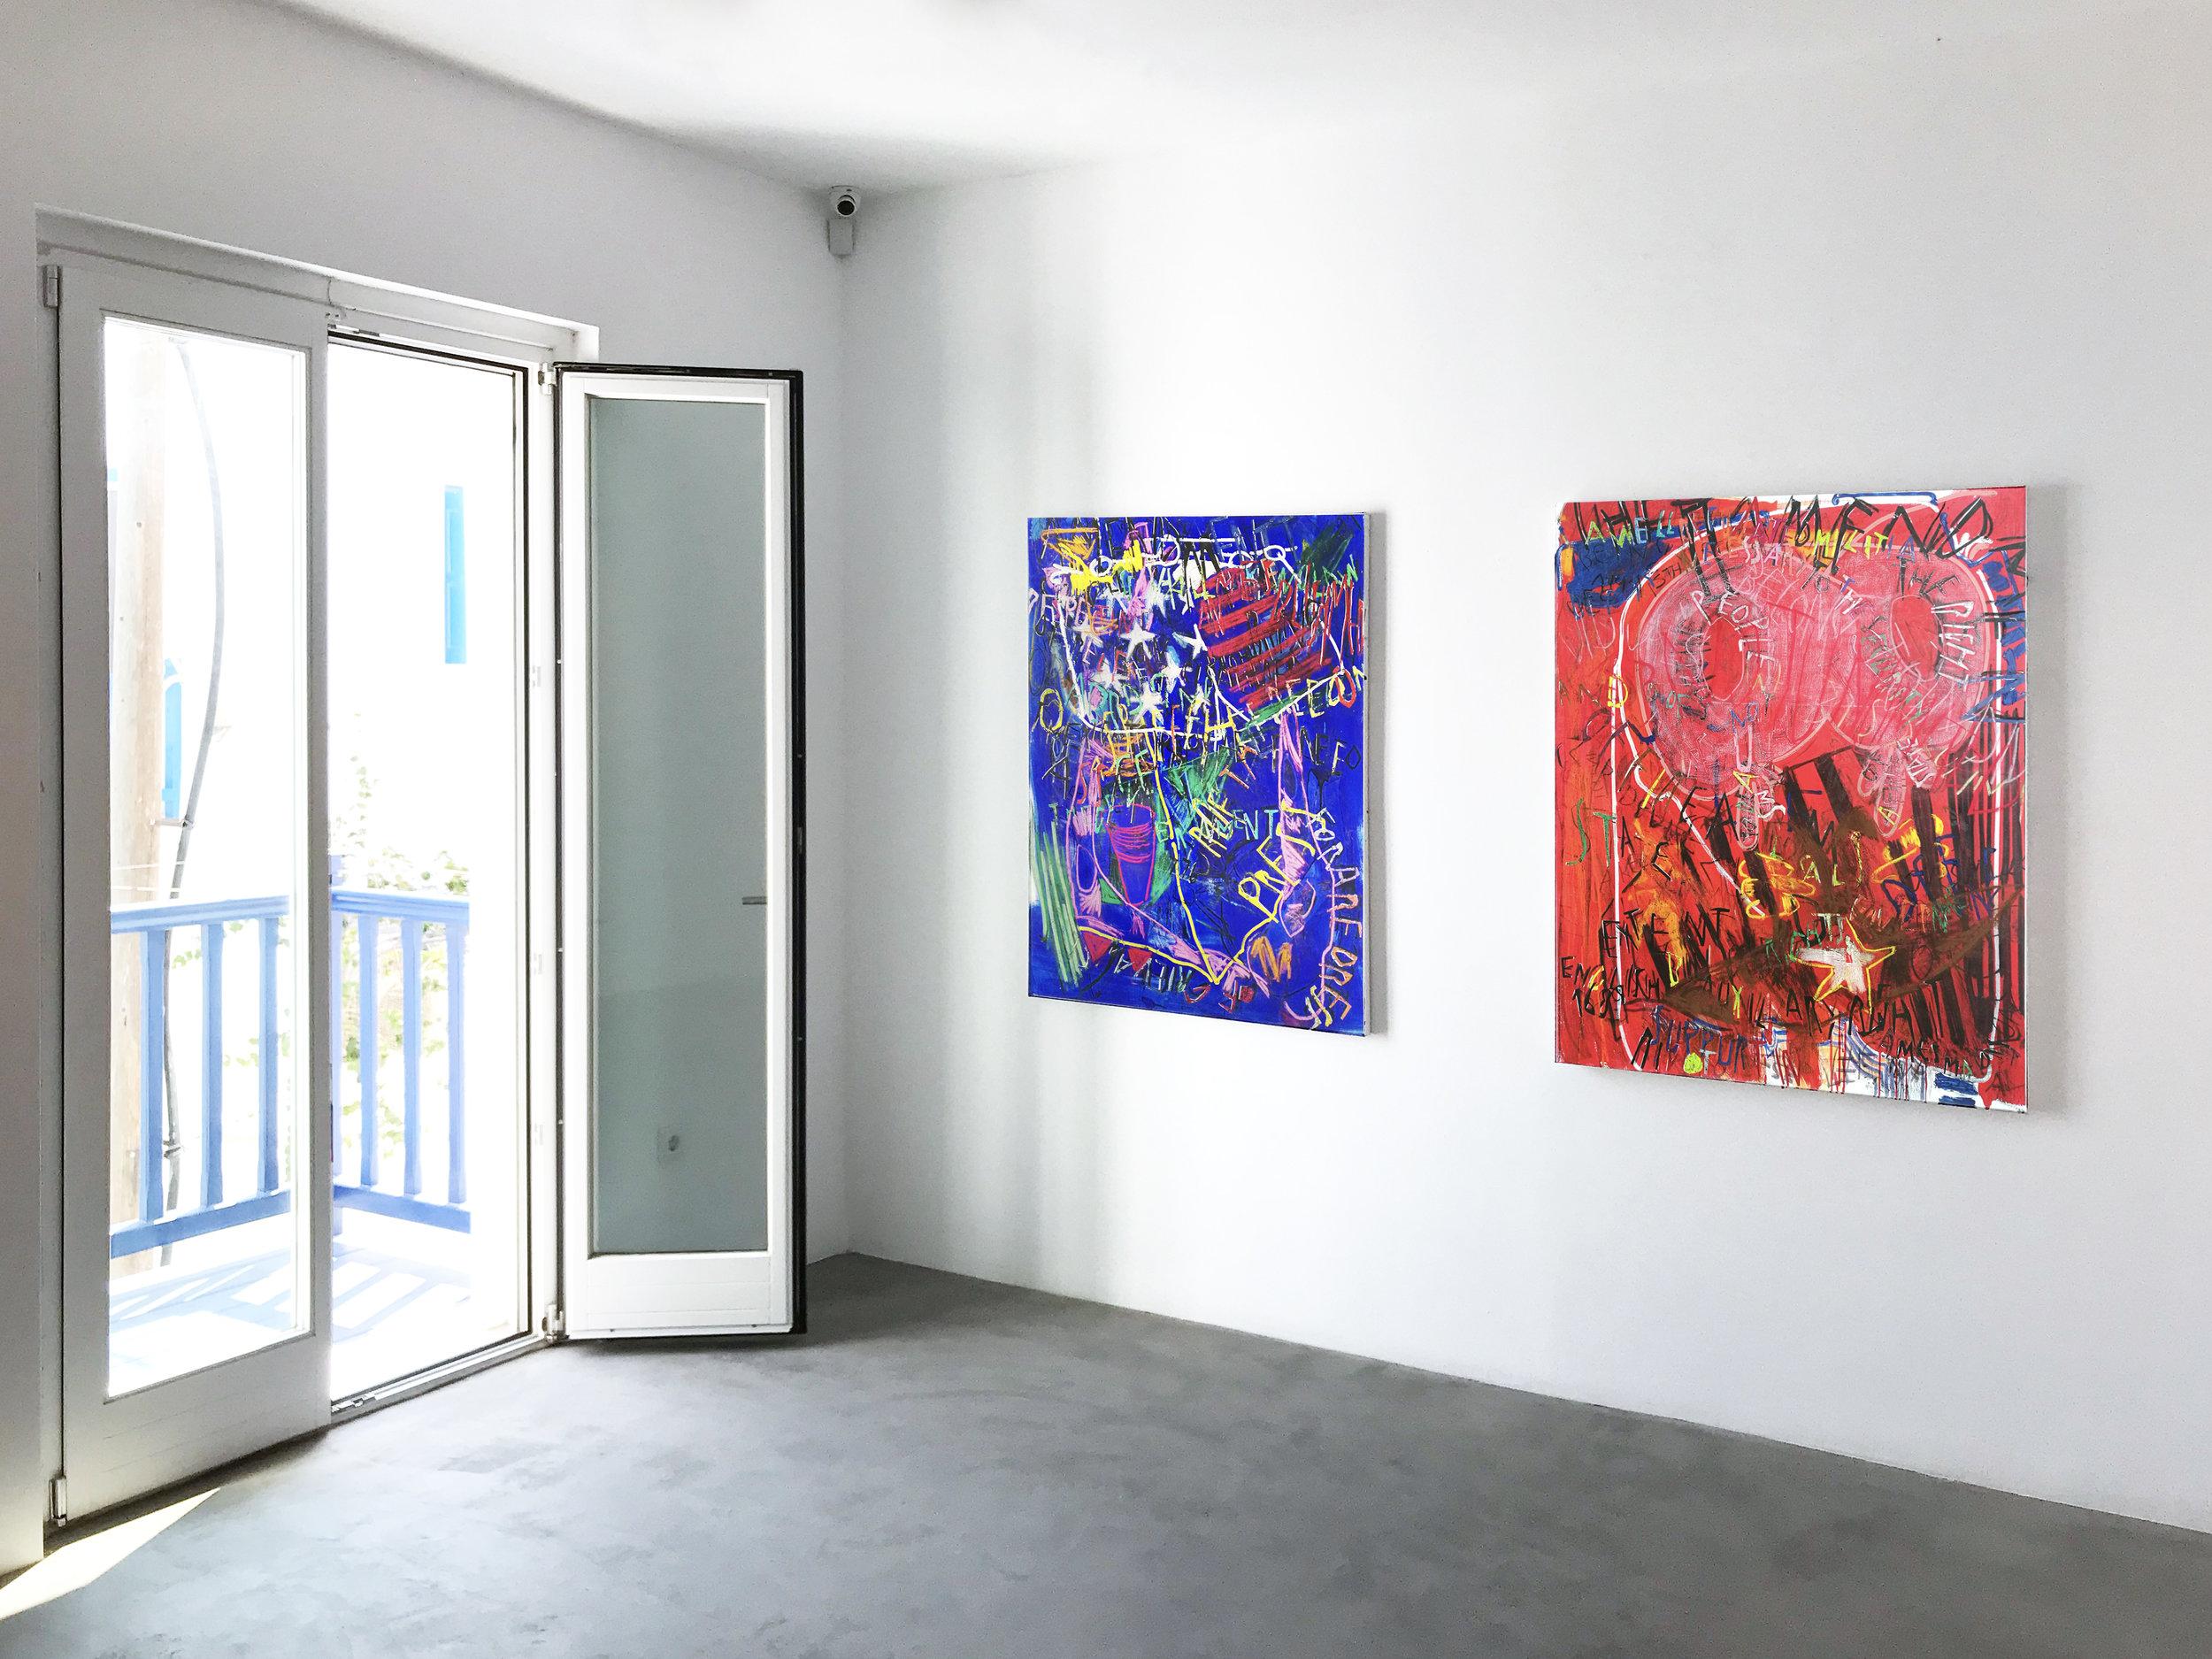 Despina Stokou_Sticky Watermwlon Love_RGB affirmations (blue), RGB affirmations (red)_2018_installation shot.jpg